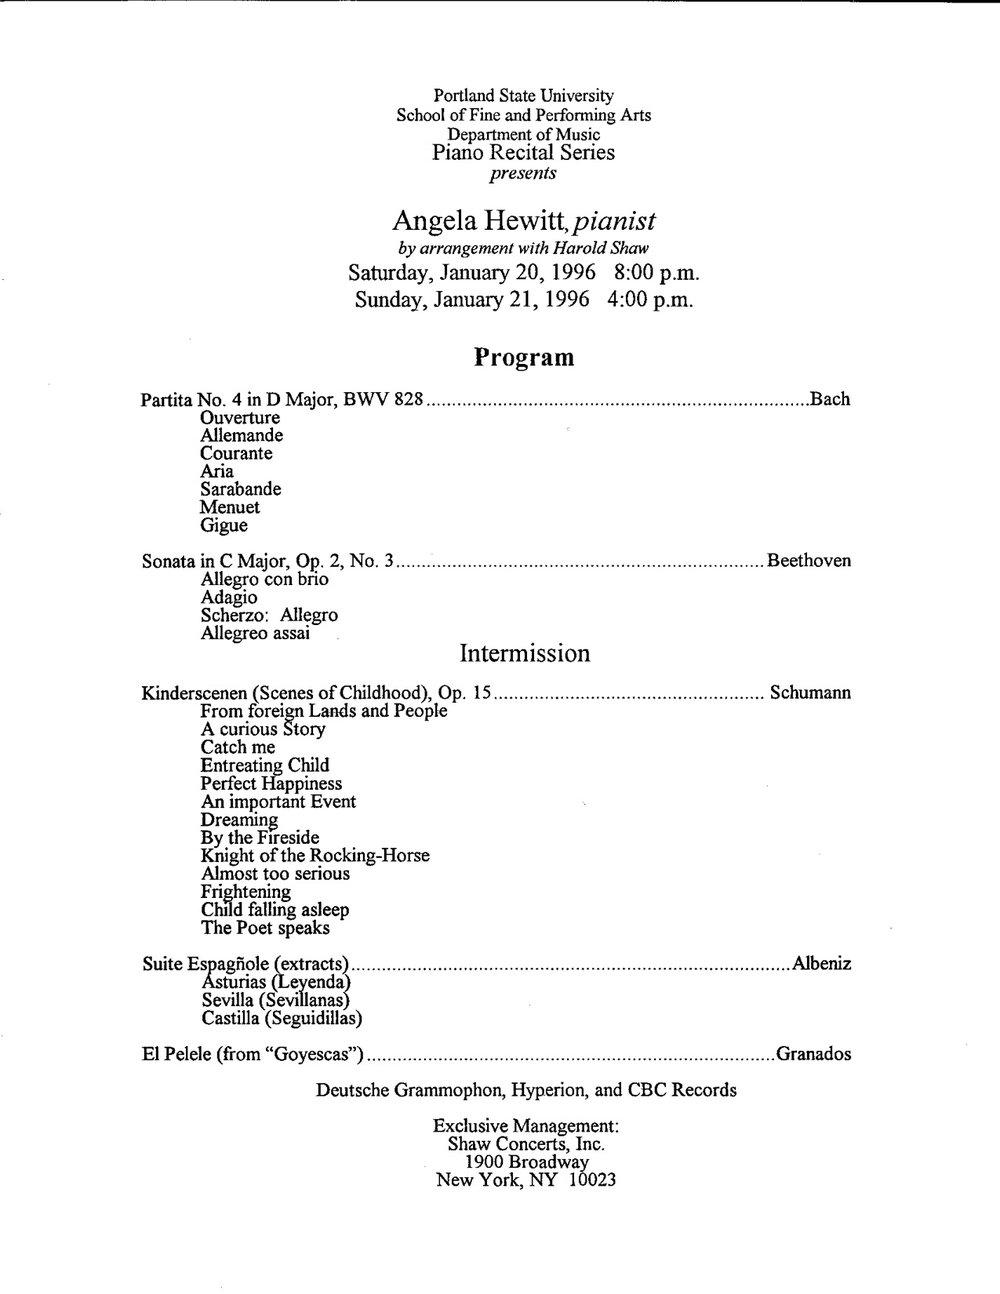 Hewitt95-96_Program2.jpg